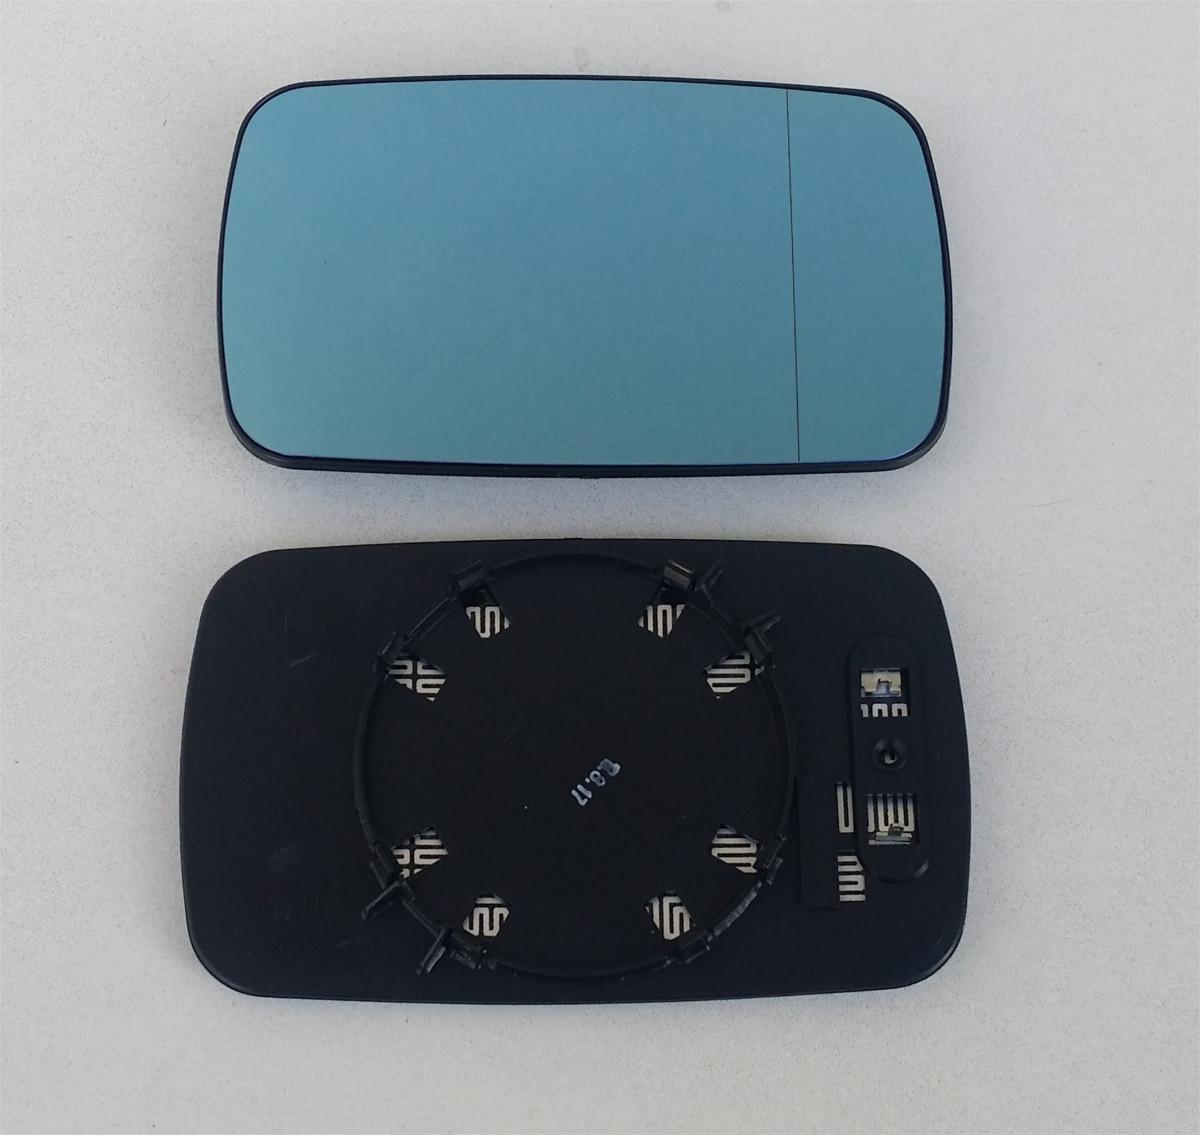 bmw 3er e46 e 46 spiegelglas spiegel glas beheizbar rechts. Black Bedroom Furniture Sets. Home Design Ideas